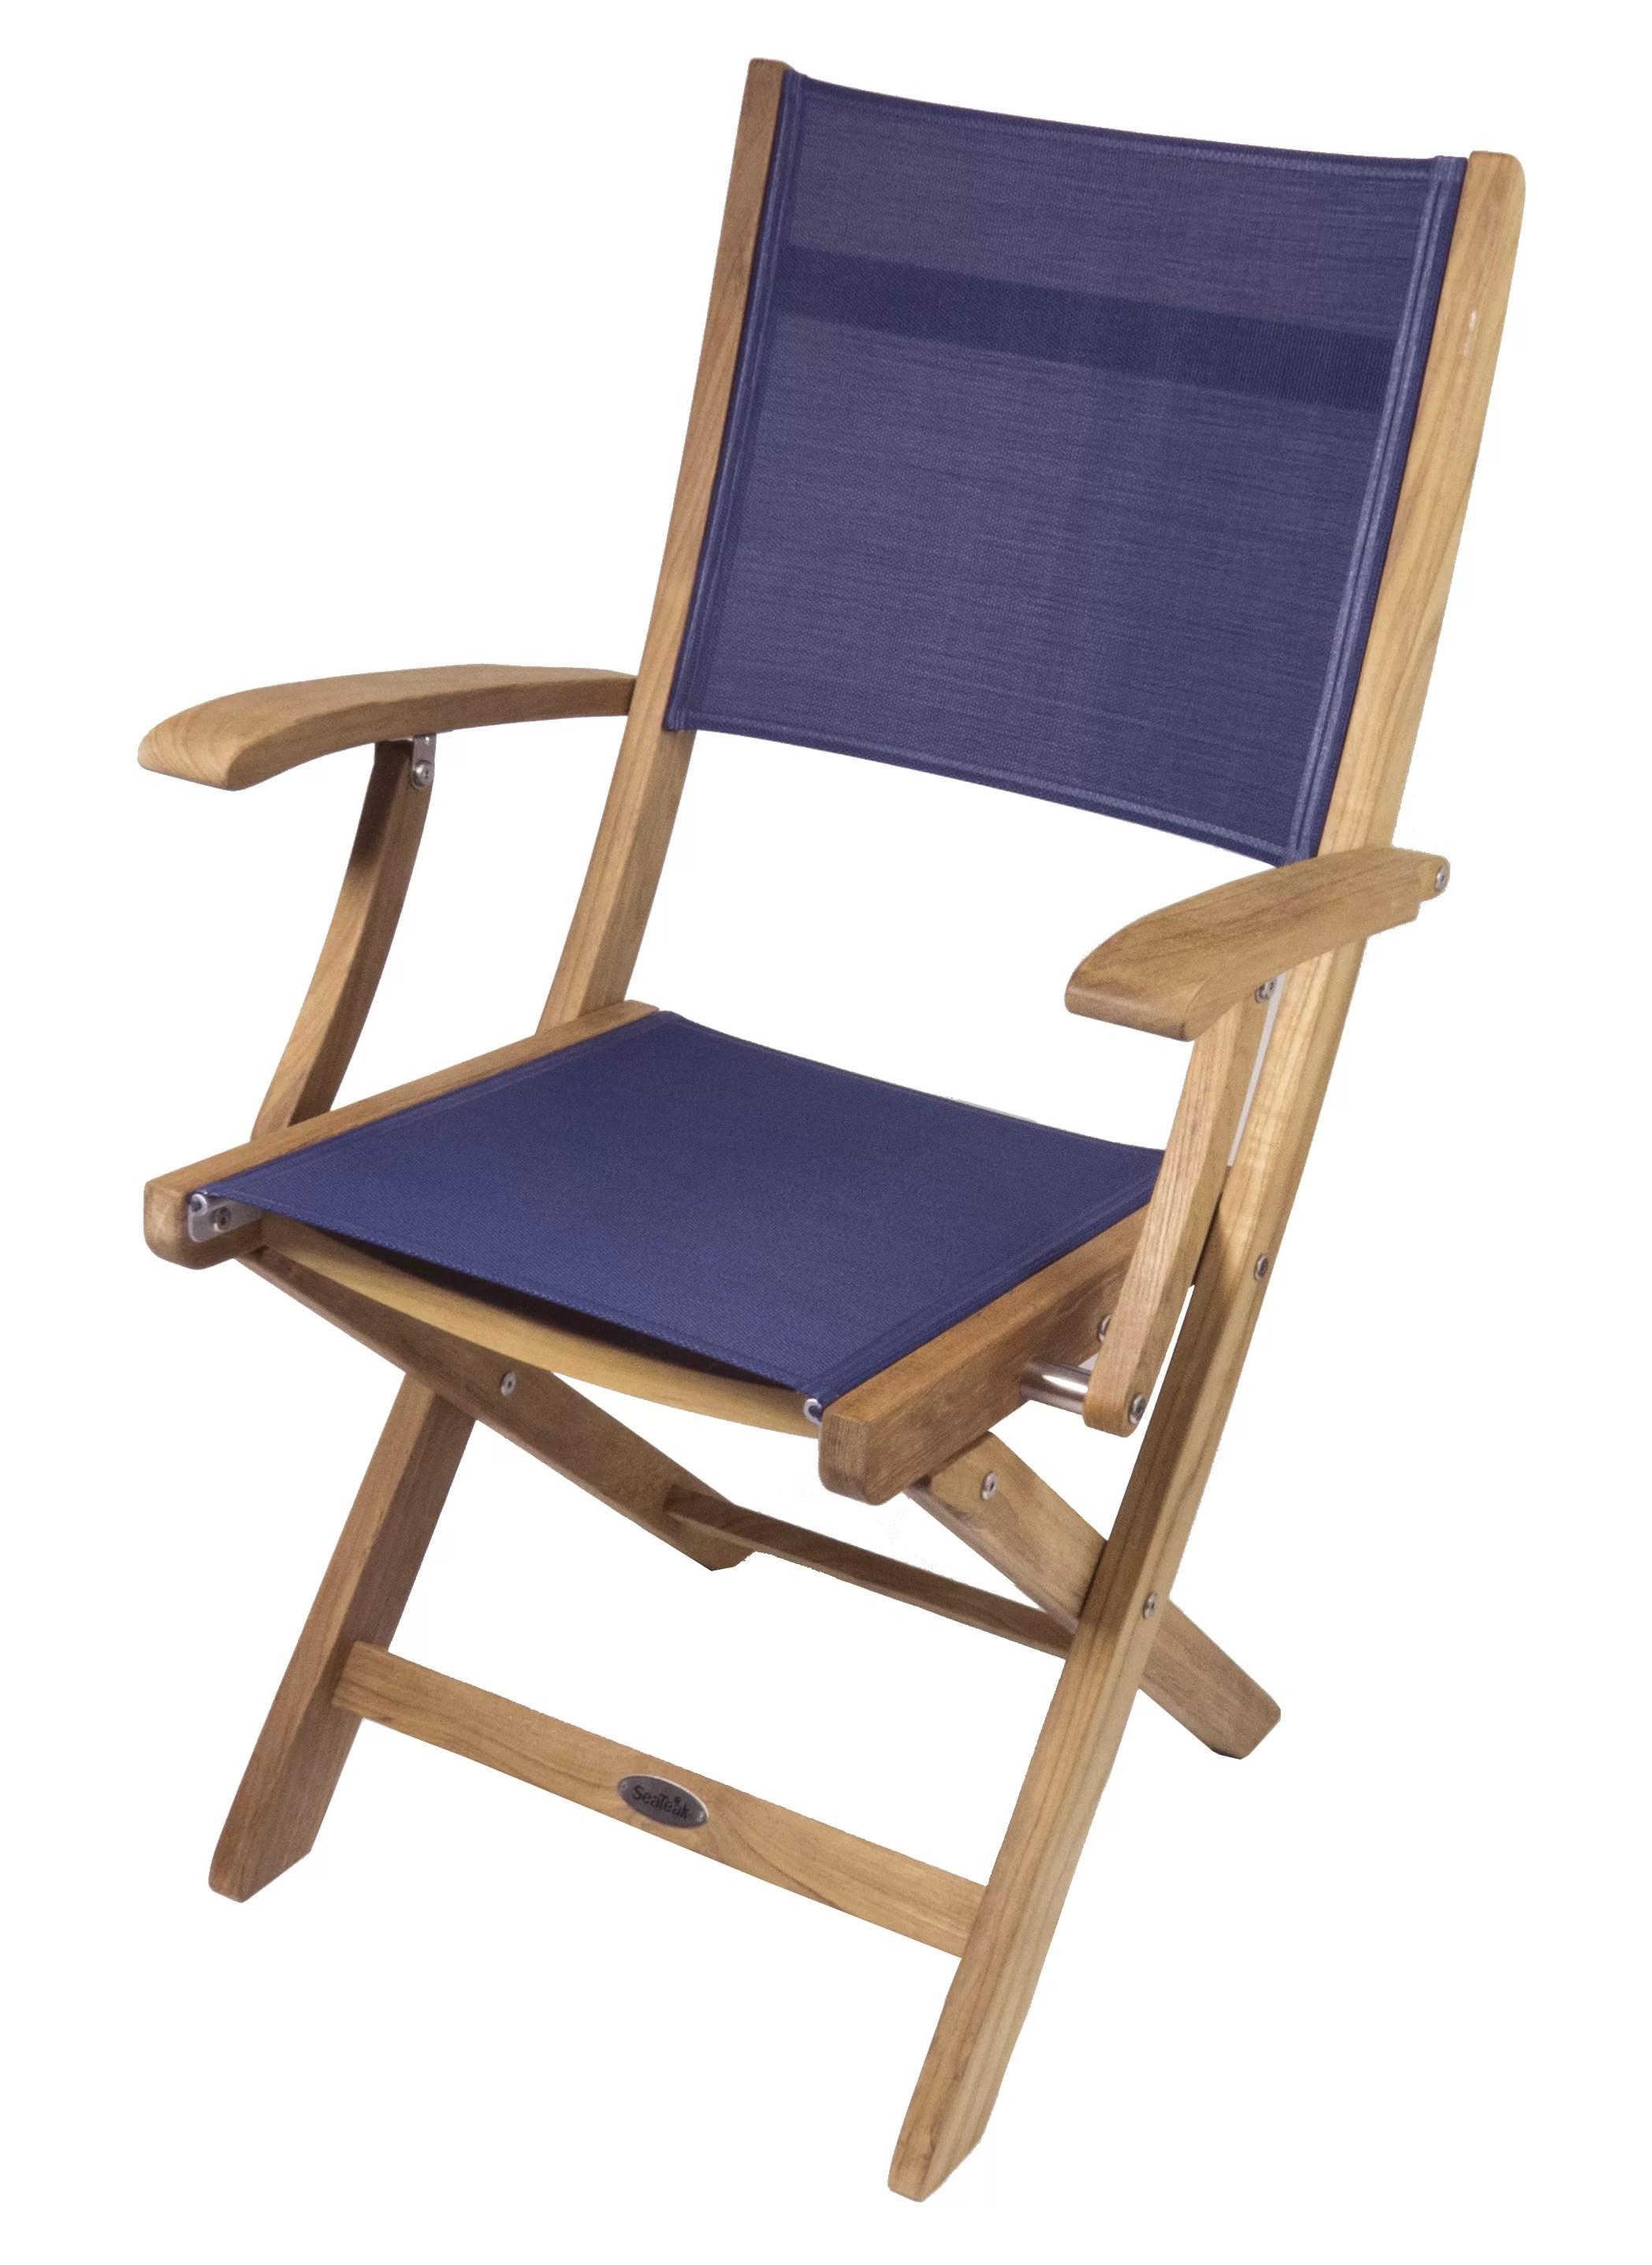 boat chairs folding deck harmony high chair seateak bimini wayfair